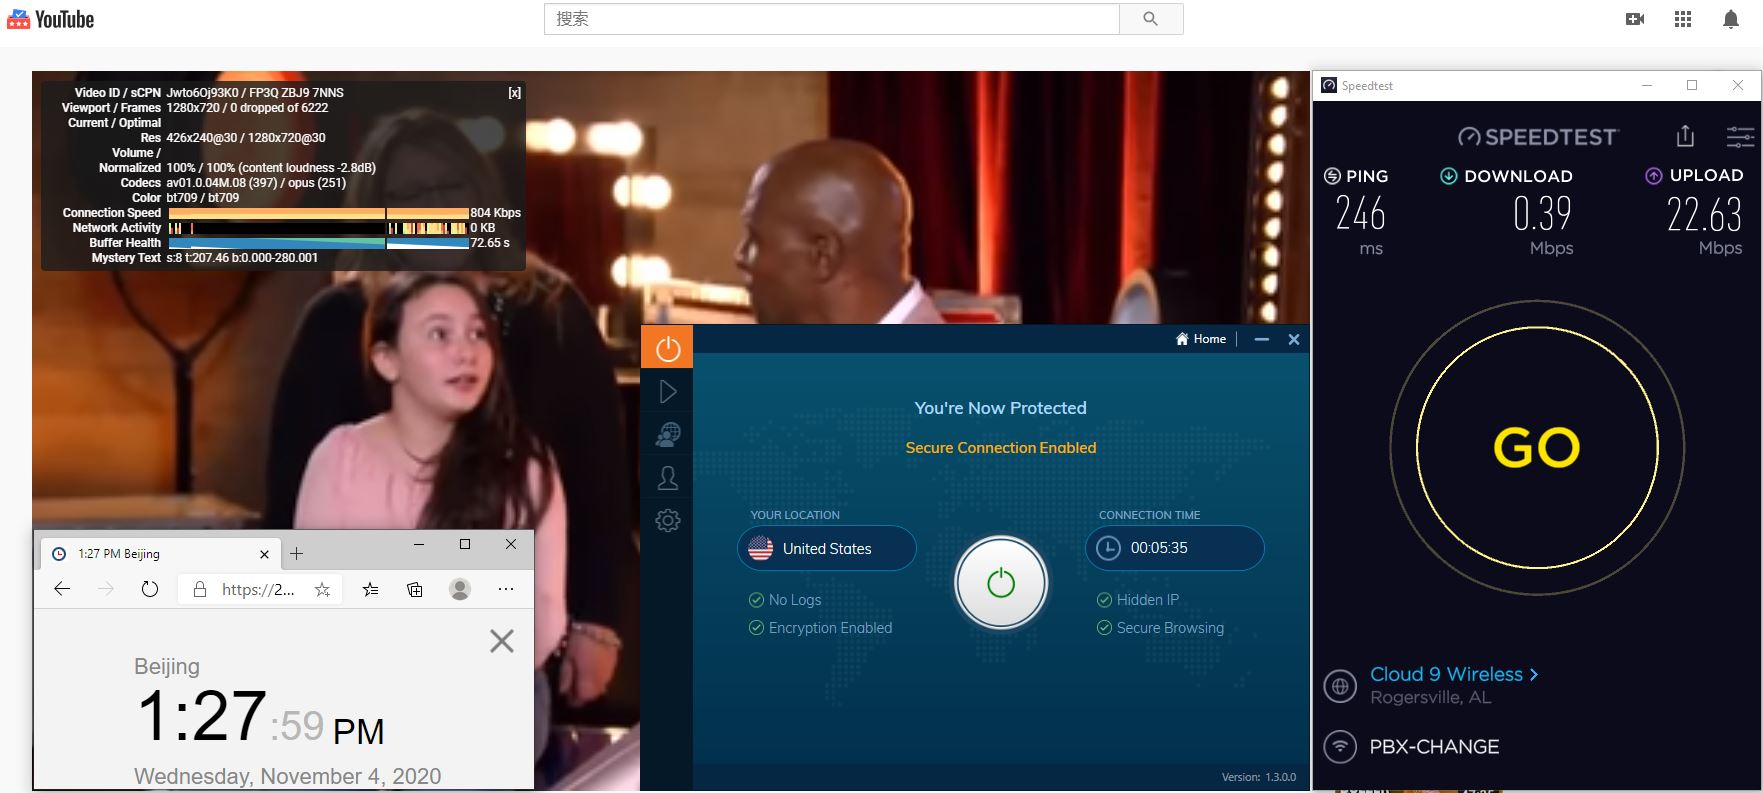 Windows10 IvacyPrime VPN USA 服务器 中国VPN 翻墙 科学上网 测试 - 20201104